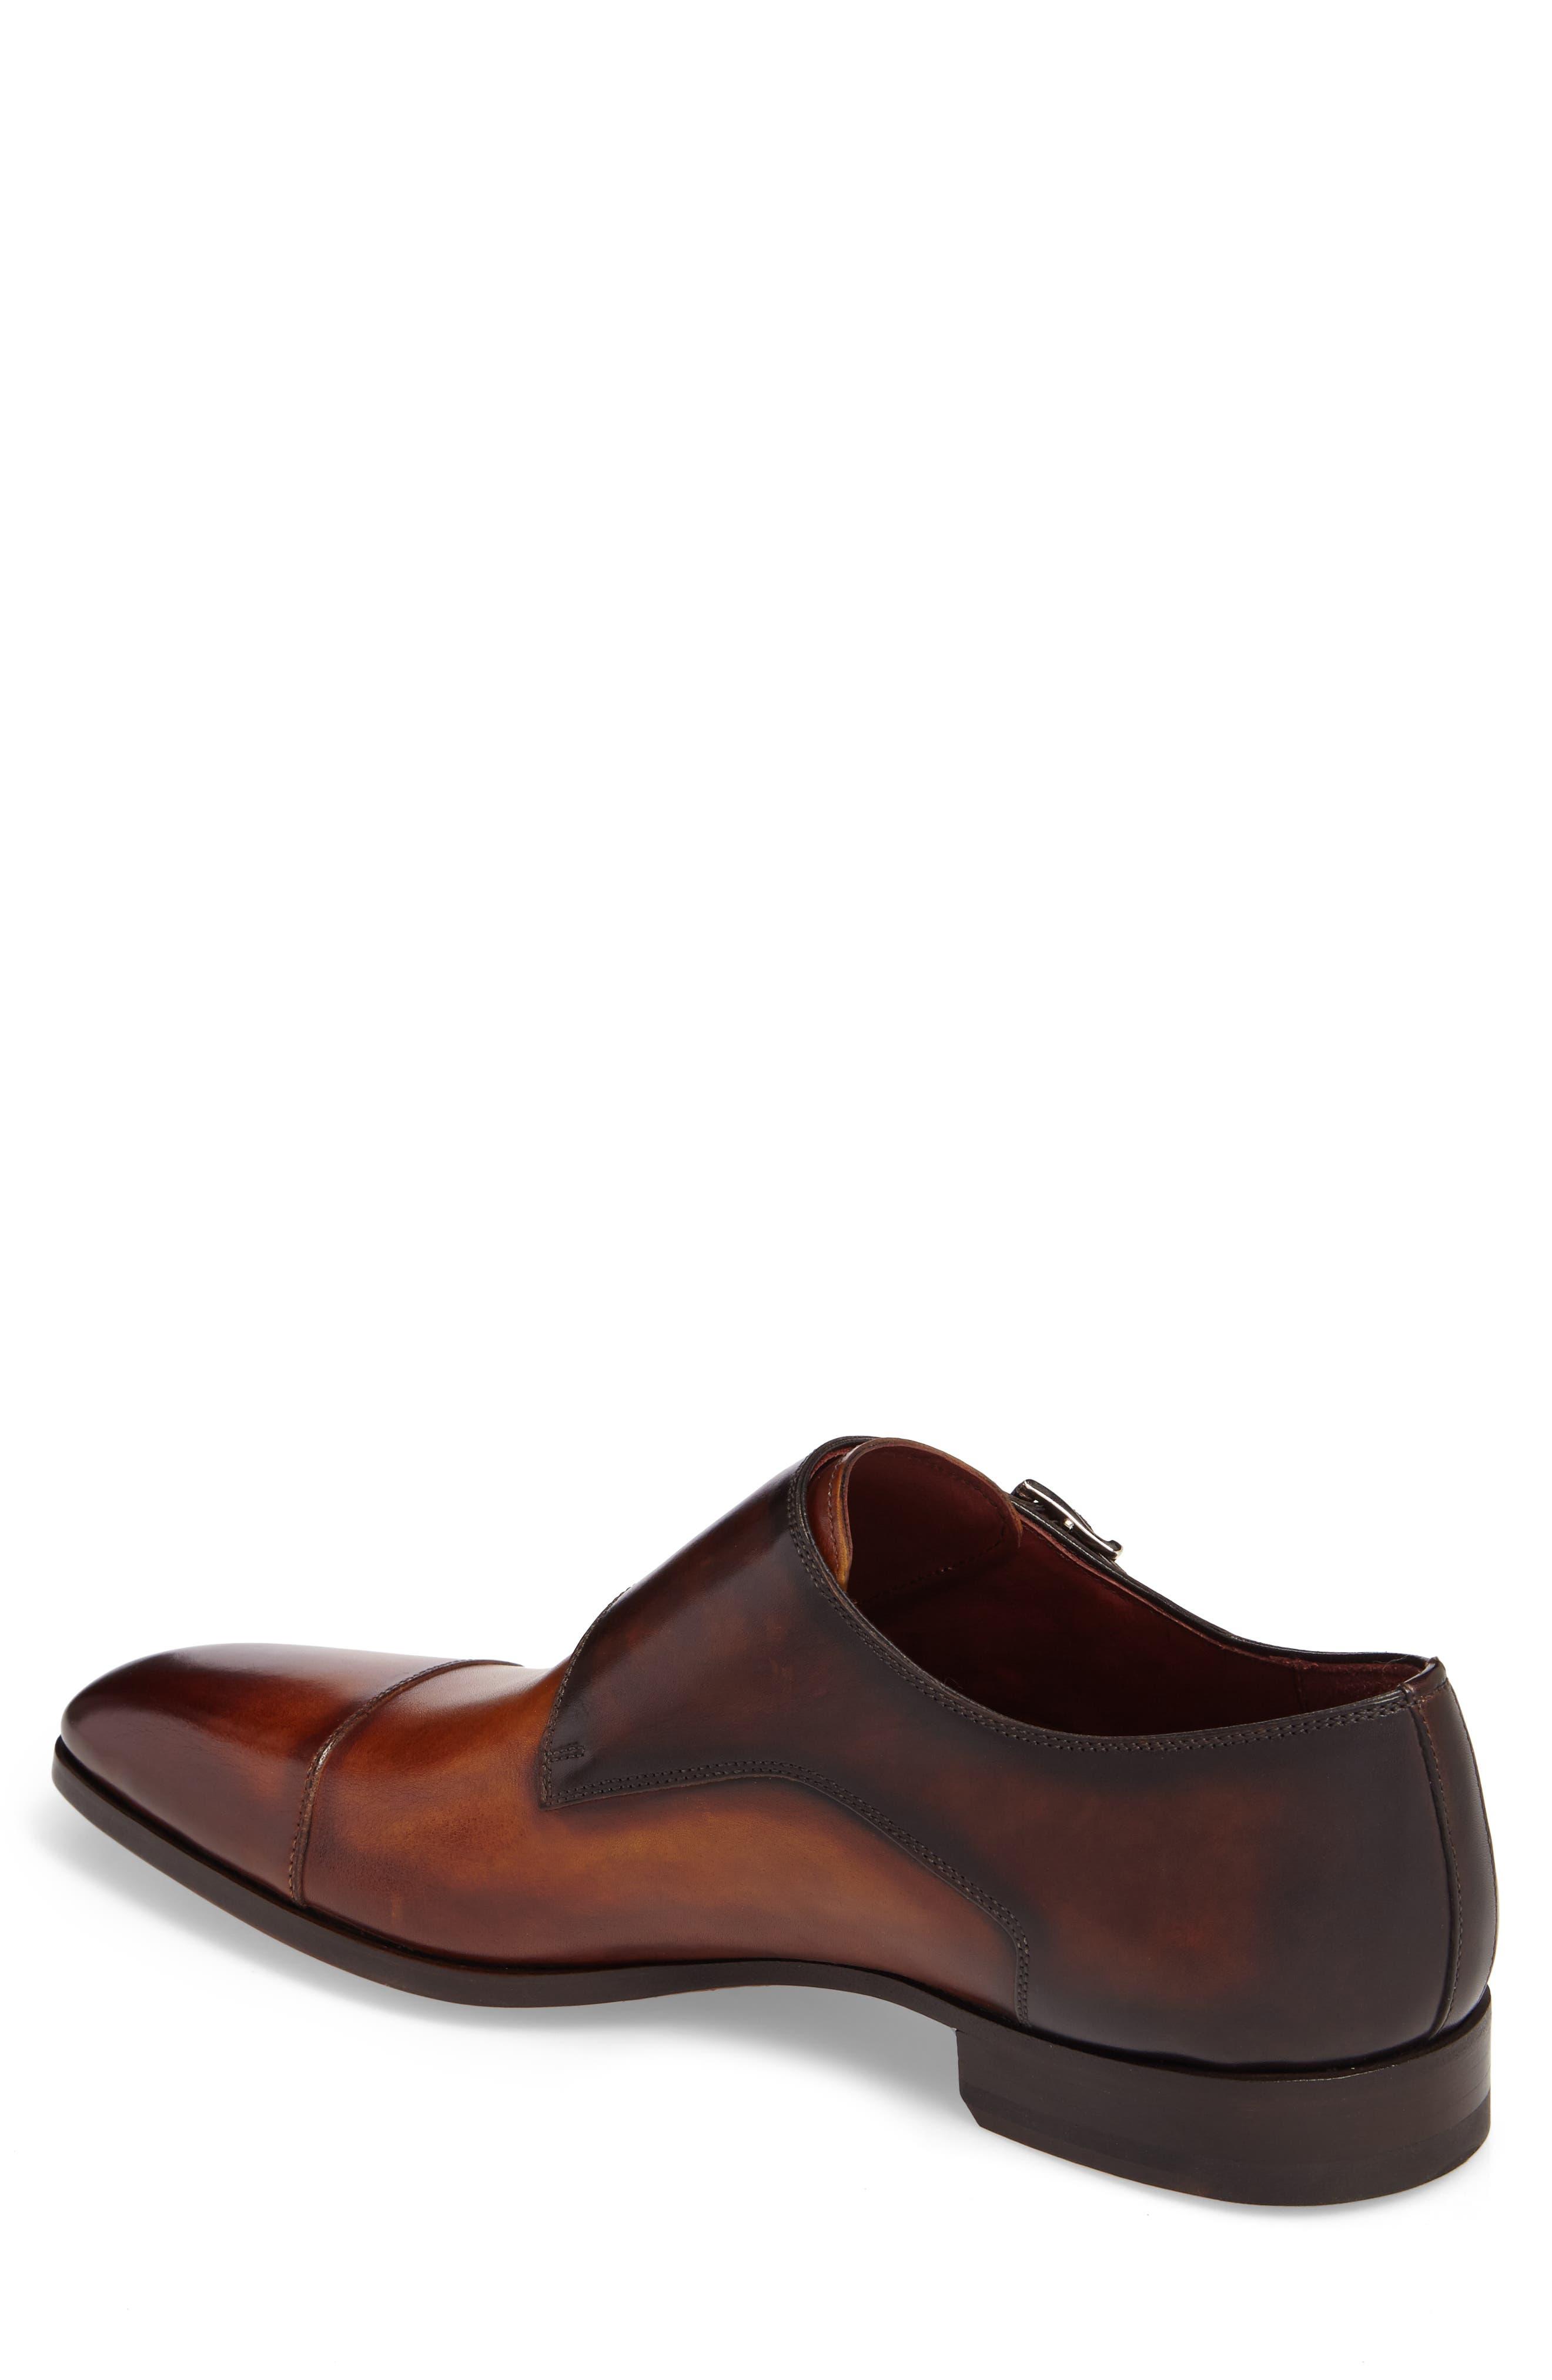 MAGNANNI,                             Ondara Double Monk Strap Shoe,                             Alternate thumbnail 2, color,                             CUERO/ BROWN LEATHER